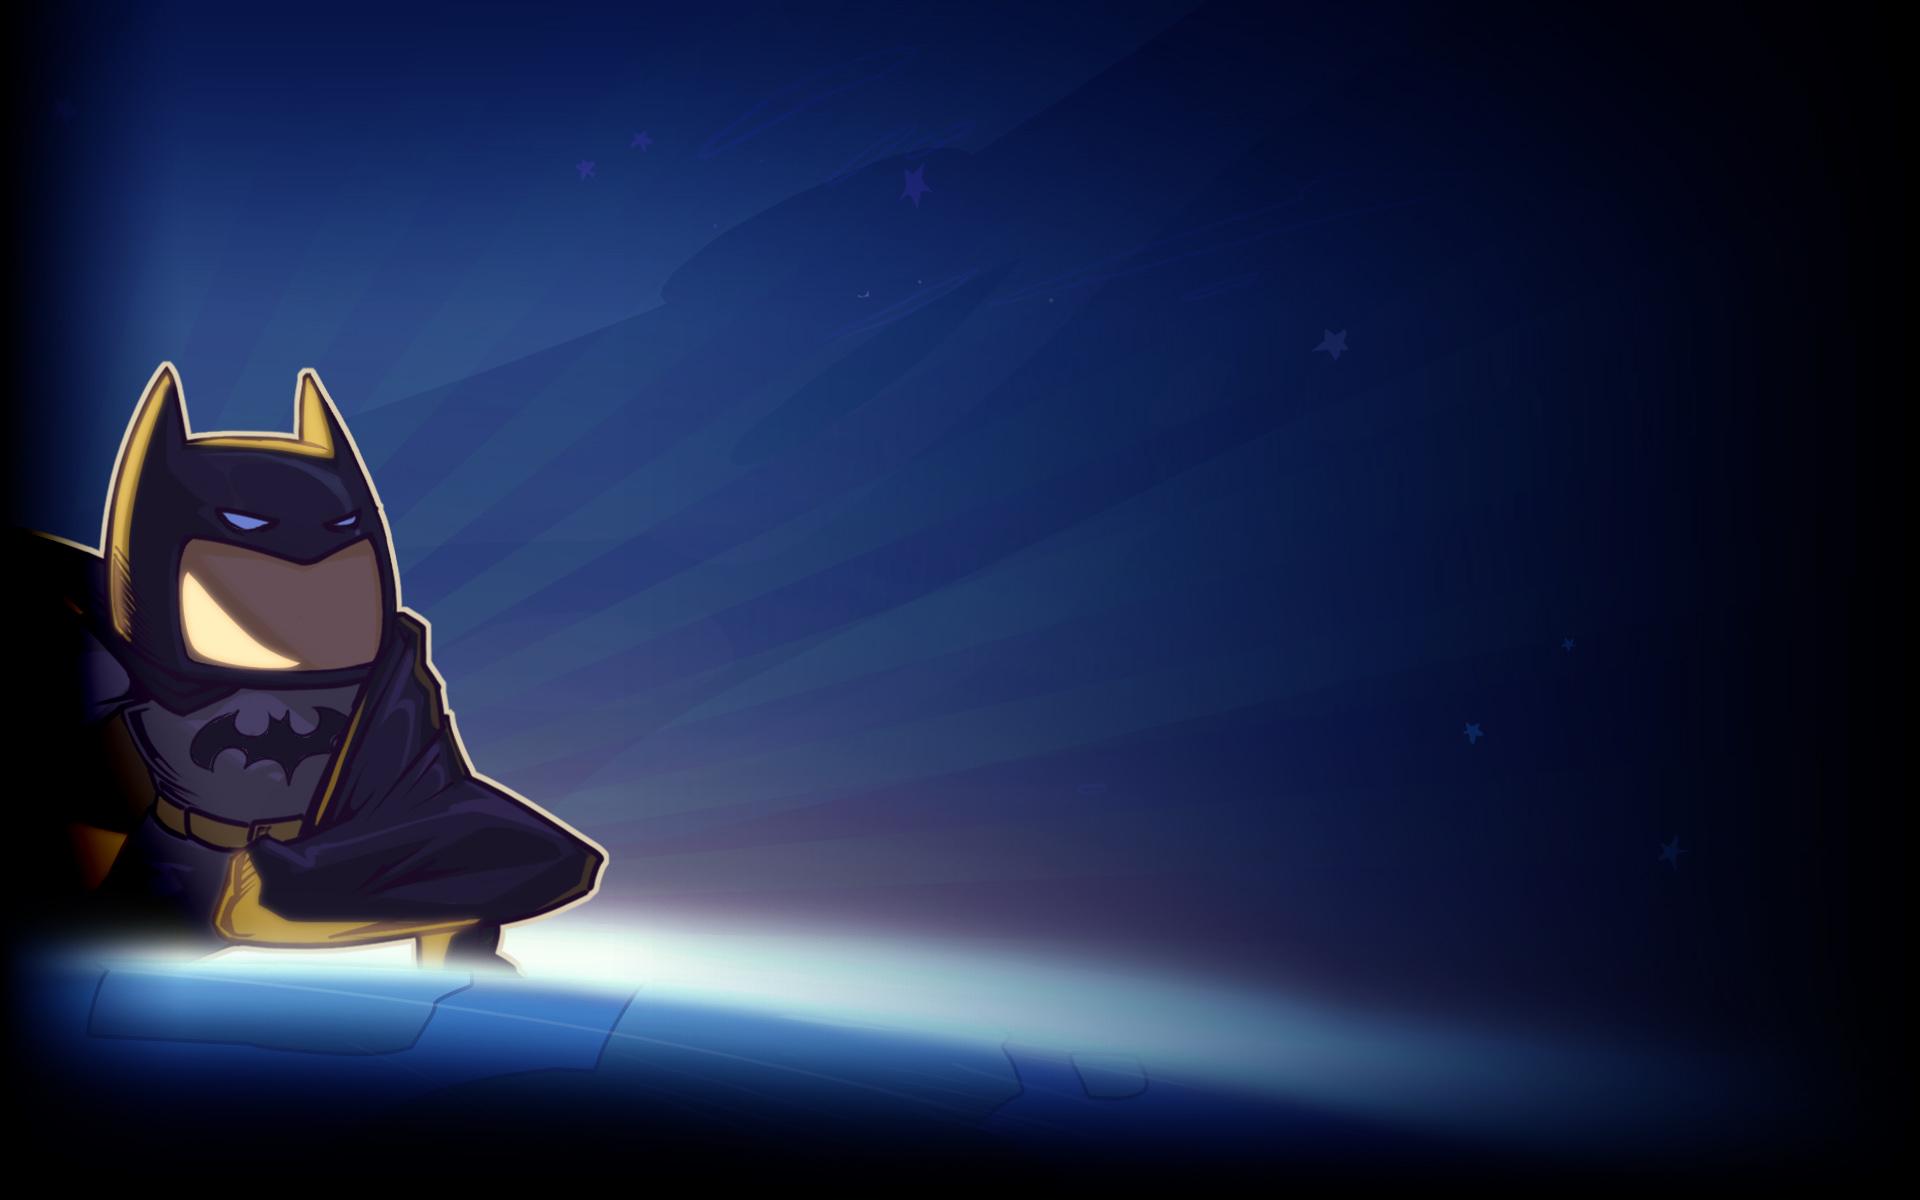 Steam Community Market Listings for 249870 Batman Profile 1920x1200